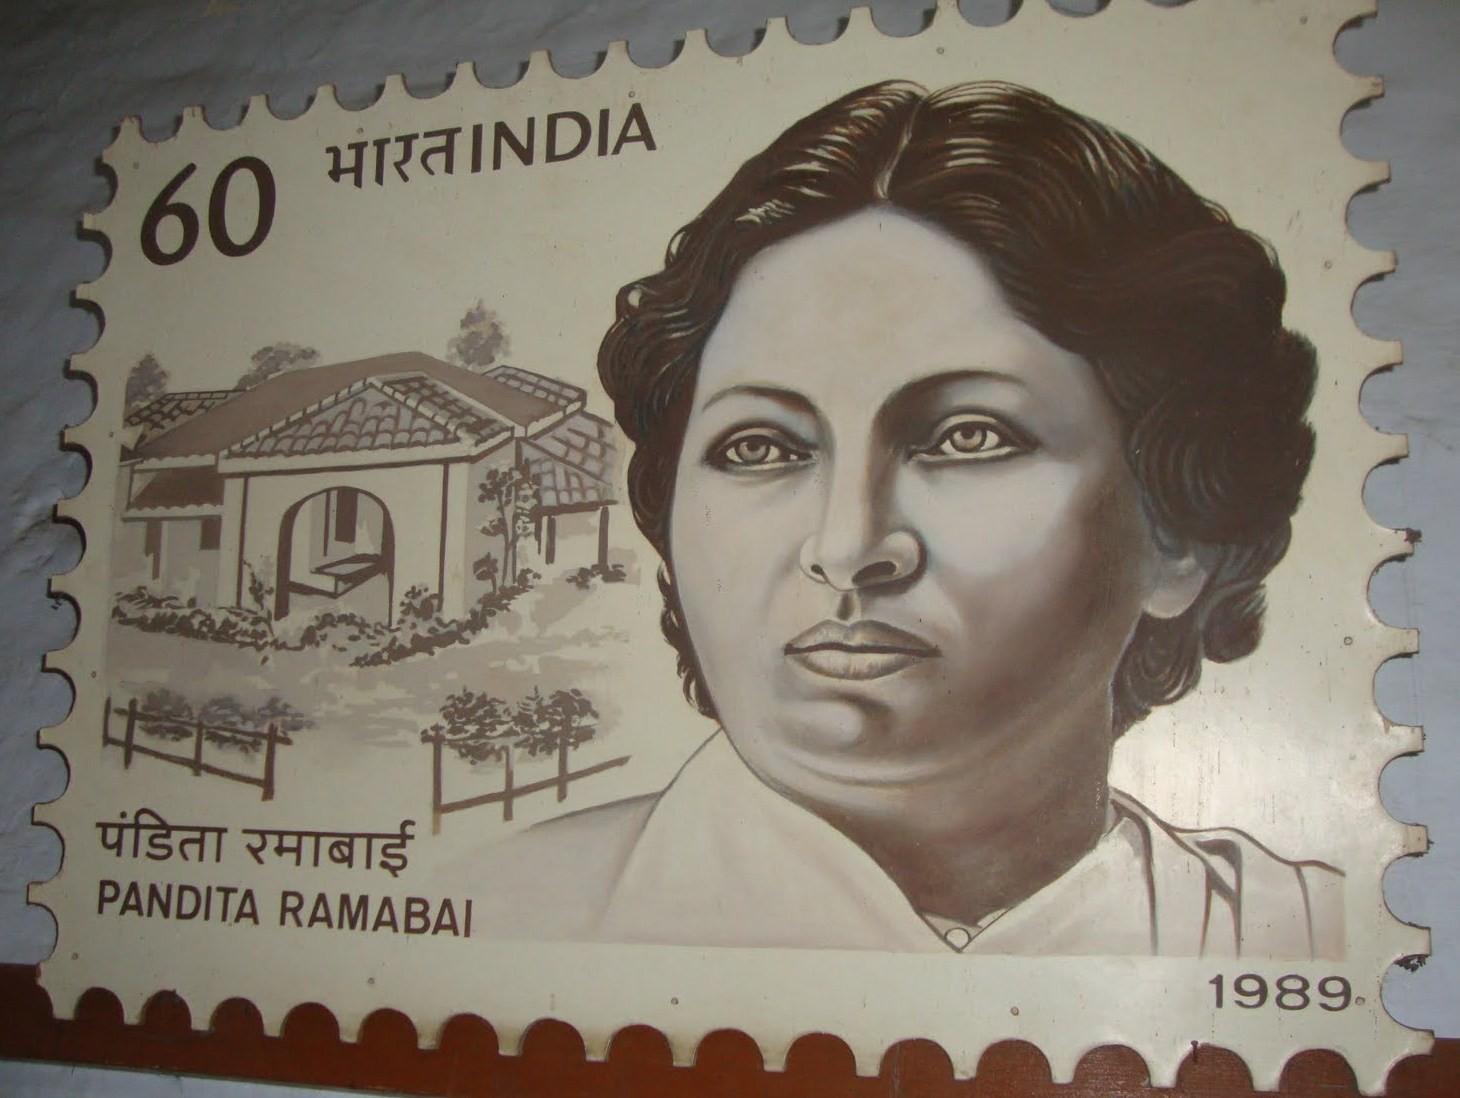 Pandita Ramabai: Championing Women's Education And Social Reform